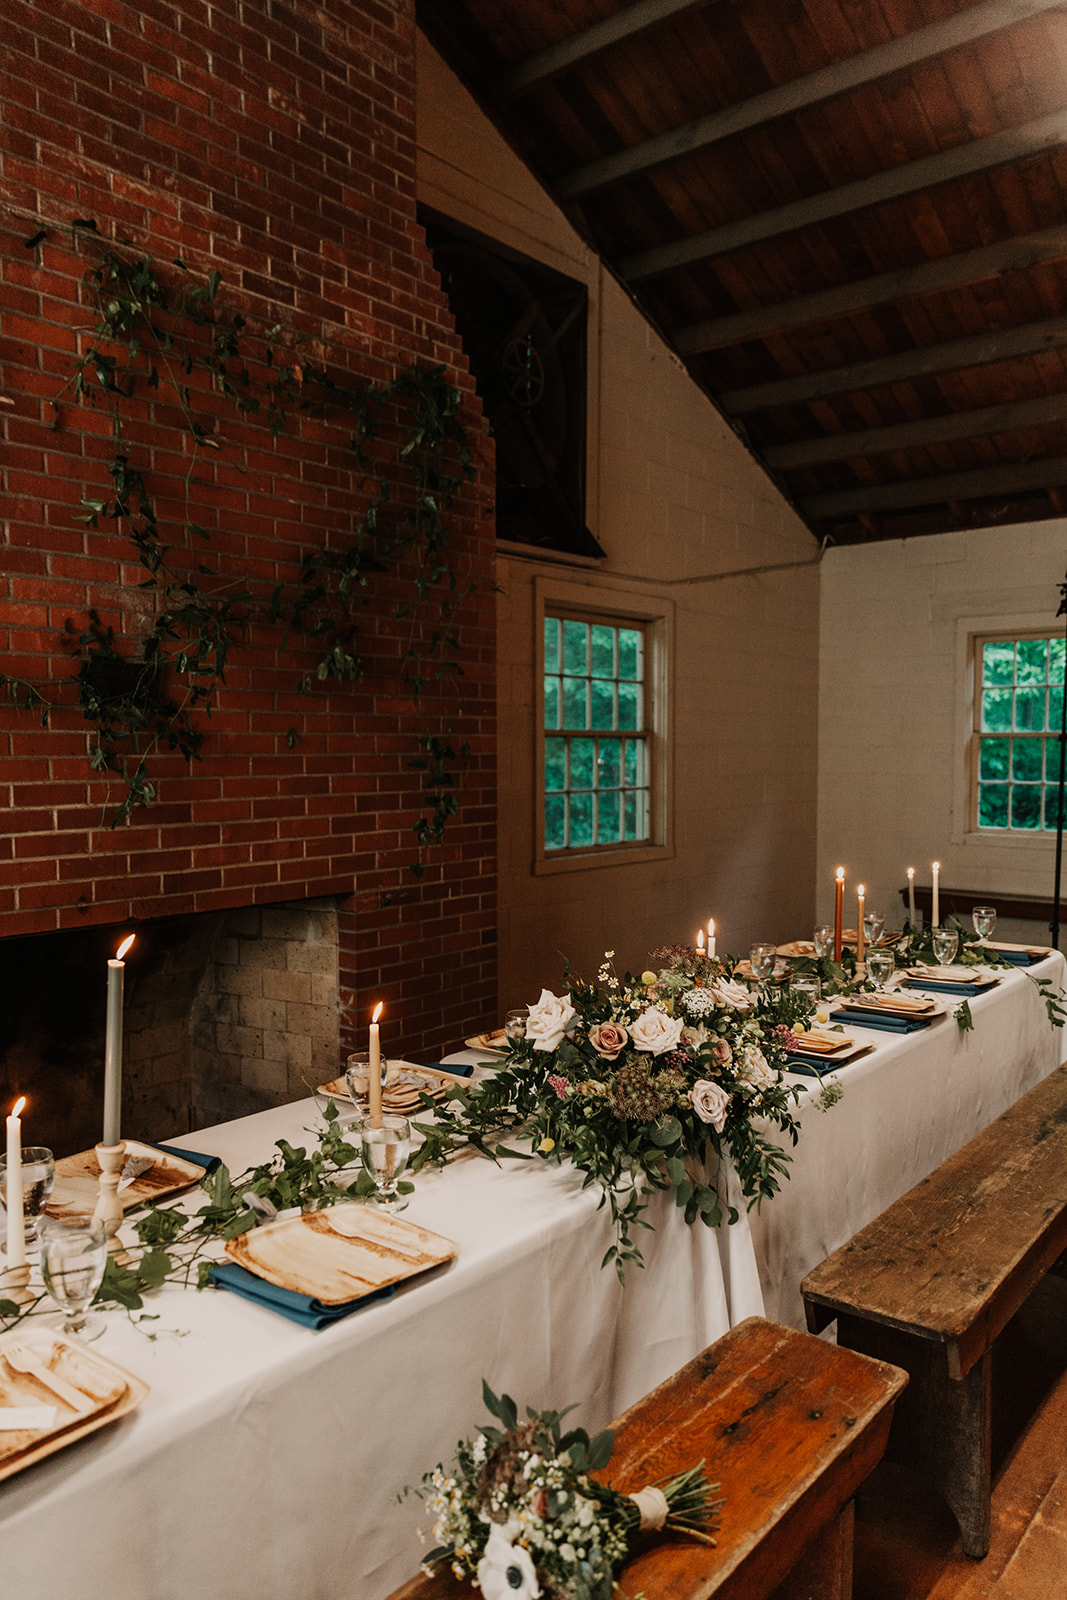 camp_wokanda_peoria_illinois_wedding_photographer_wright_photographs_bliese_0881.jpg